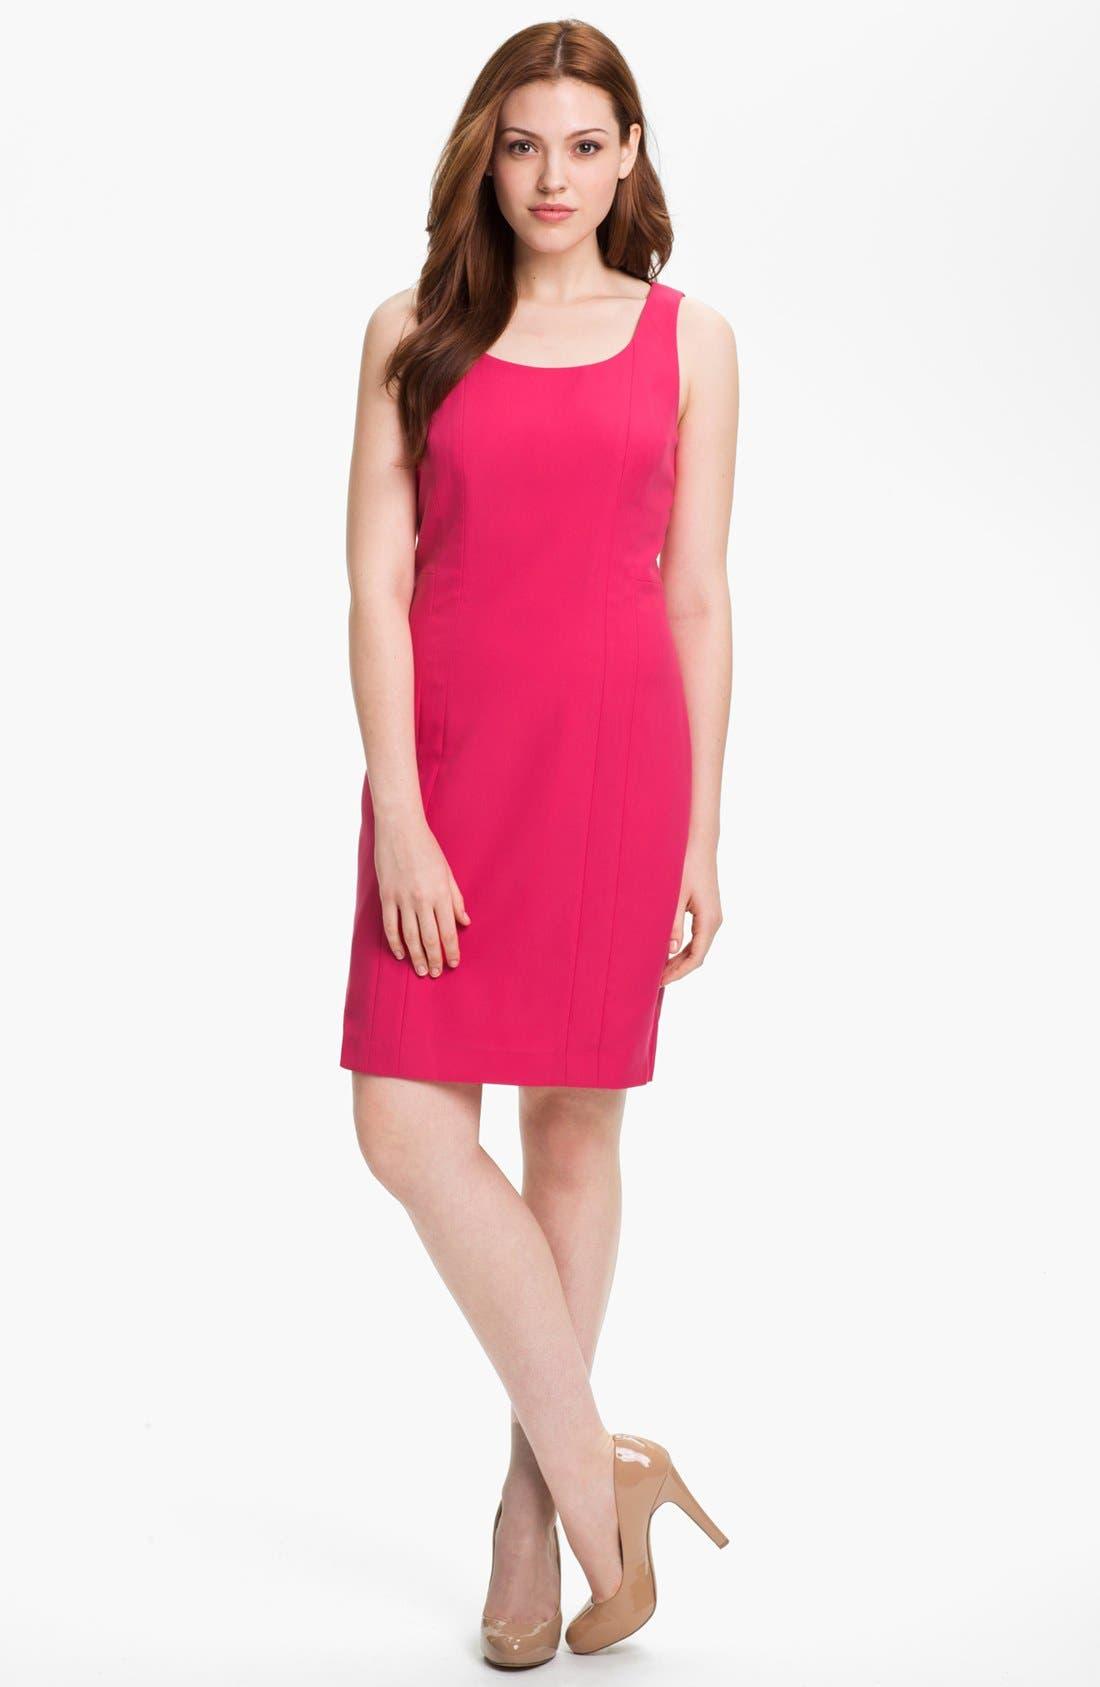 Alternate Image 1 Selected - Halogen® Seamed Sheath Dress (Petite)